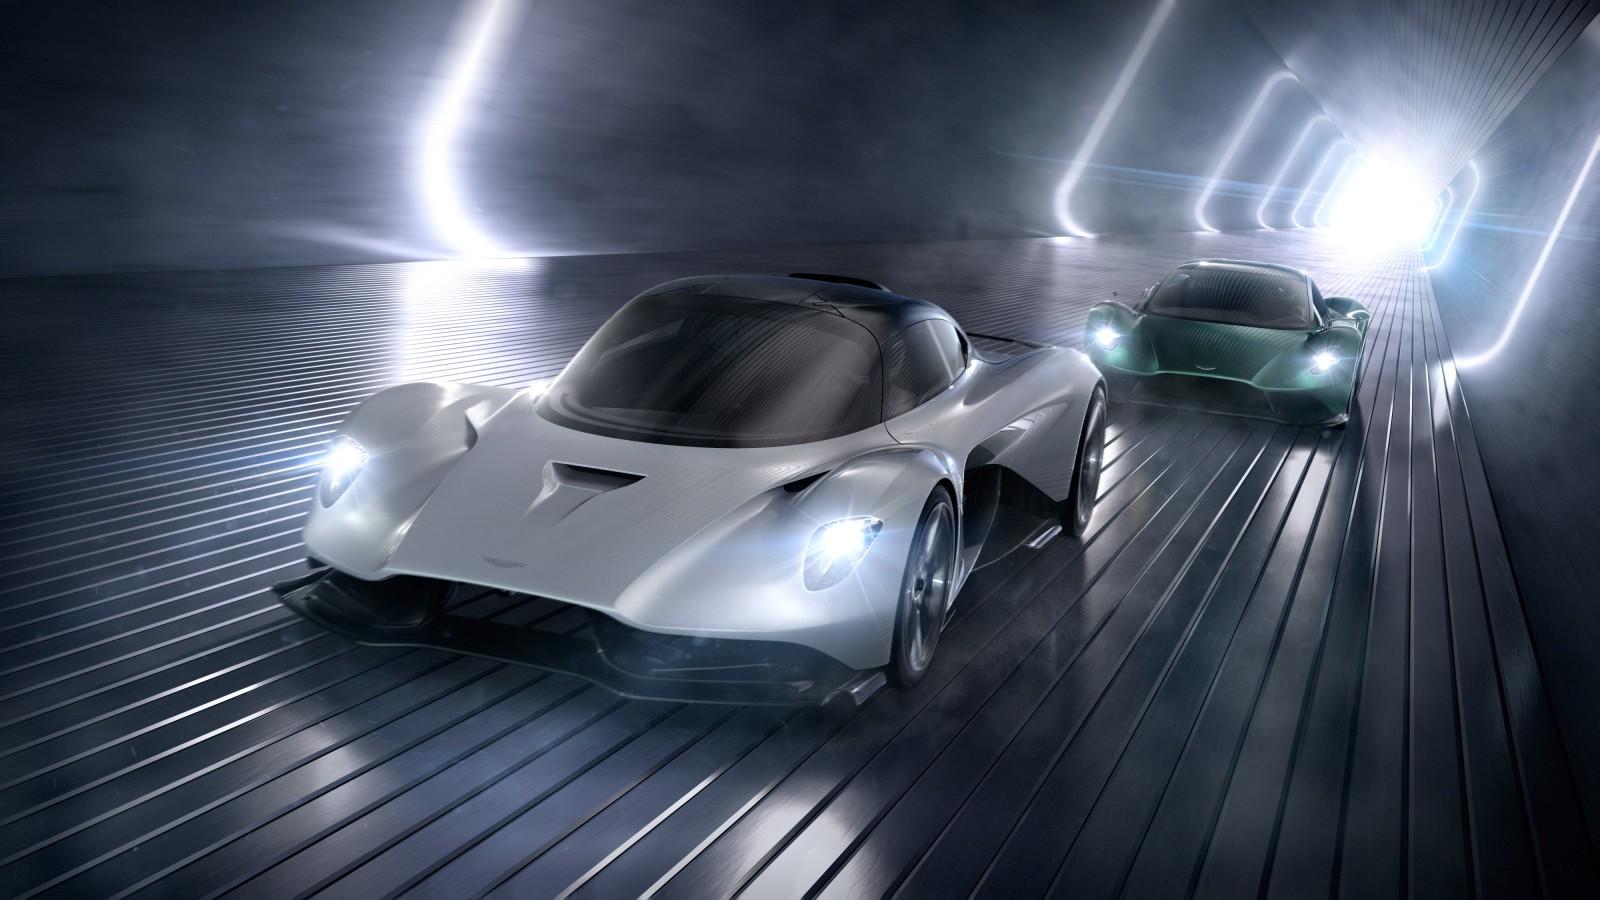 Audi Iphone X Wallpaper Aston Martin Vanquish Vision Concept Project 003 4k